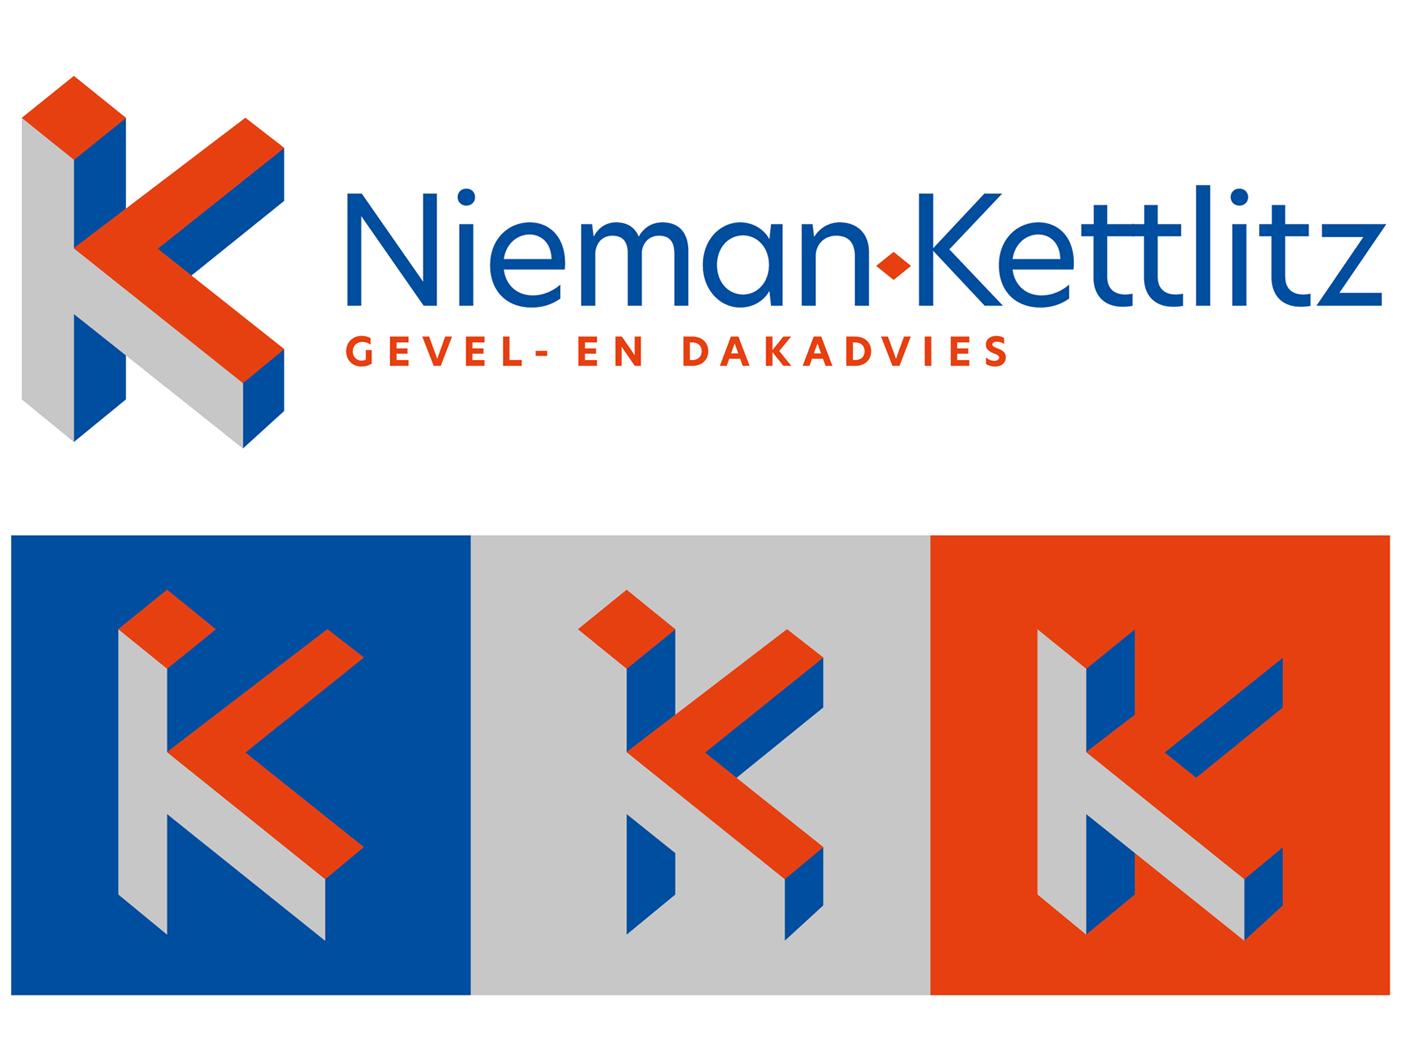 Nieman_Kettlitz_logo